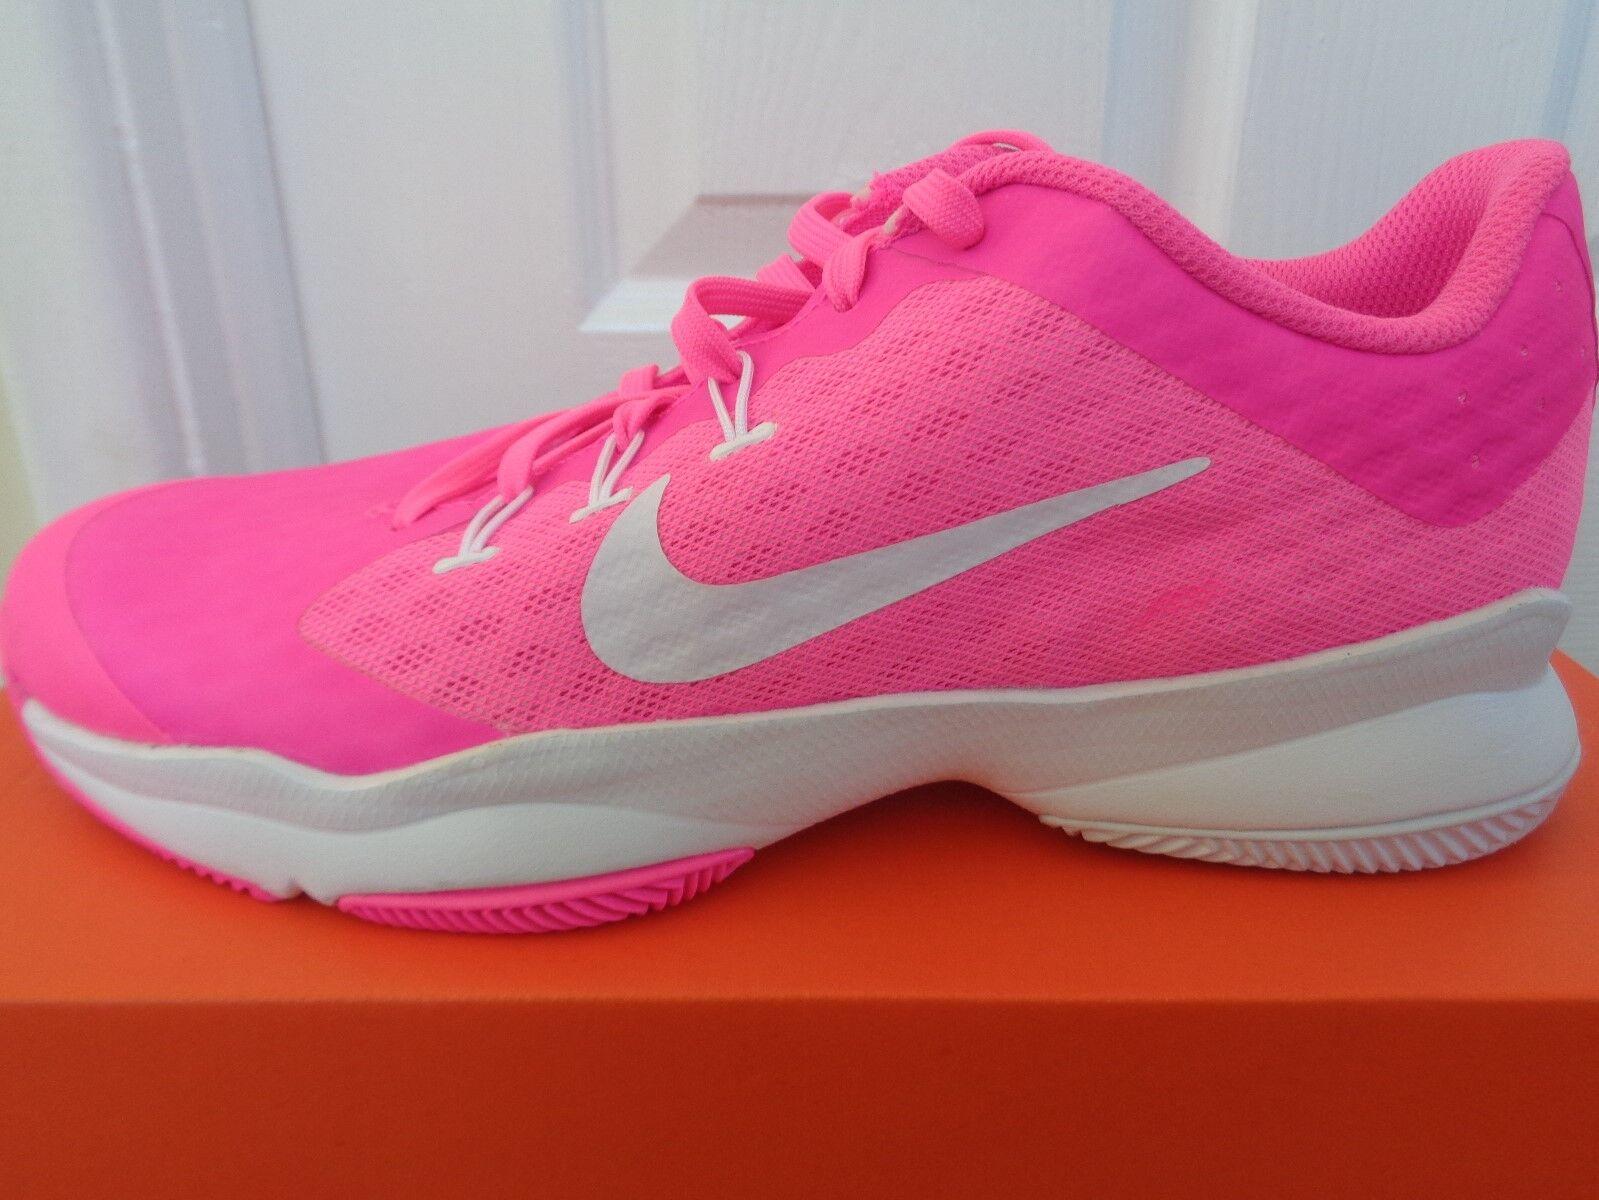 Nike Air Zoom Ultra Damenss trainers schuhe 845046 610 uk uk uk 3.5 eu 36.5 us 6 NEW+BOX 532002